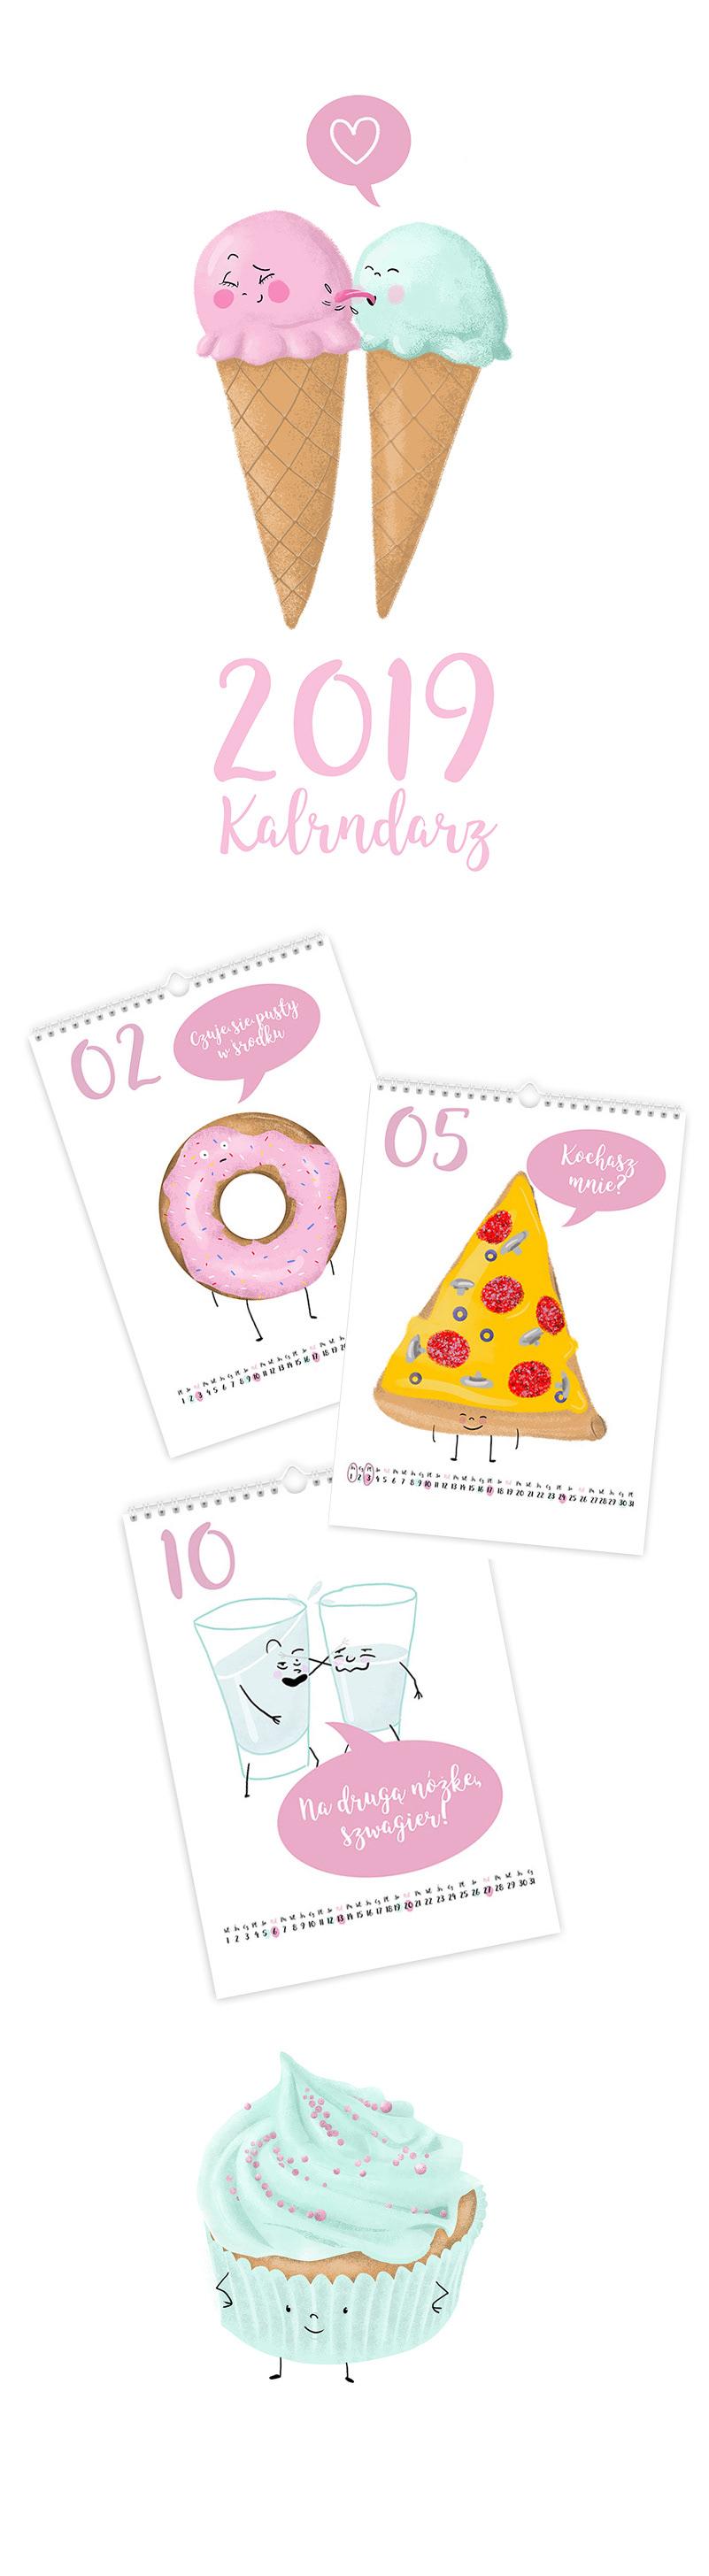 calendar icecream sweet Food  Sweets fastfood funny dessert hamburger Pizza